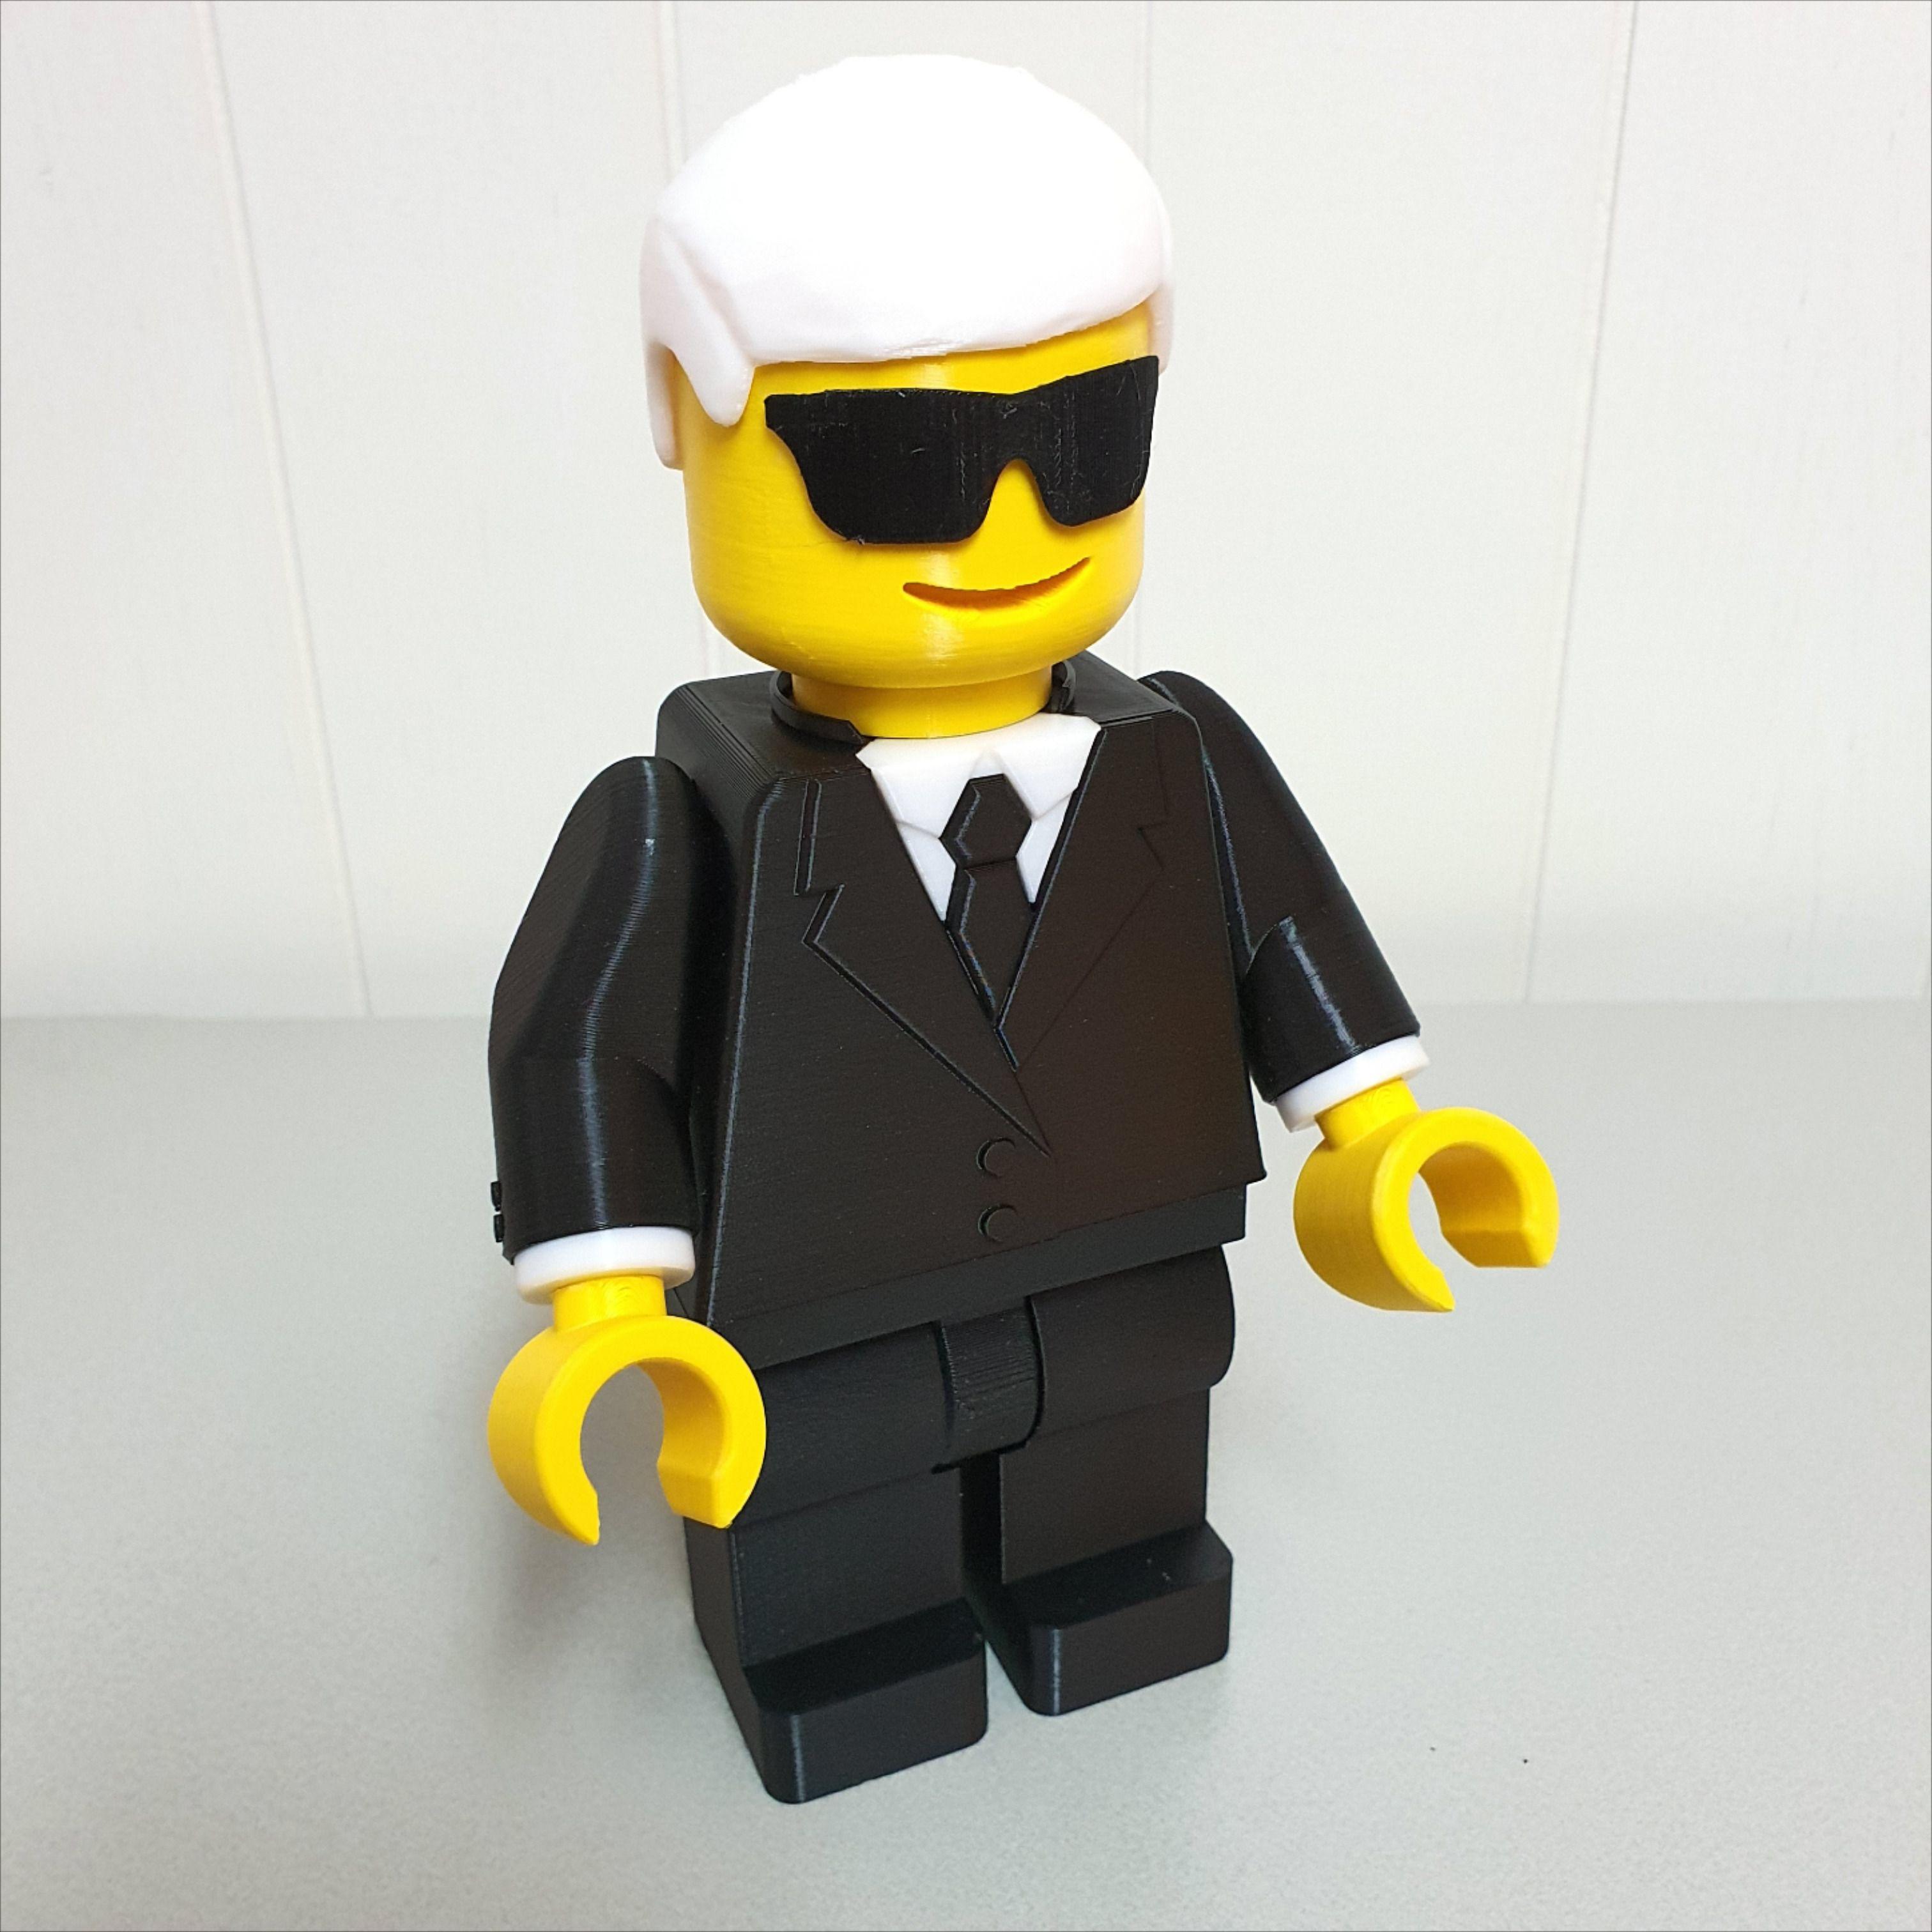 3d Druck Giant Lego Figur Men In Black In 2020 Lego Man 3d Printing Look Alike